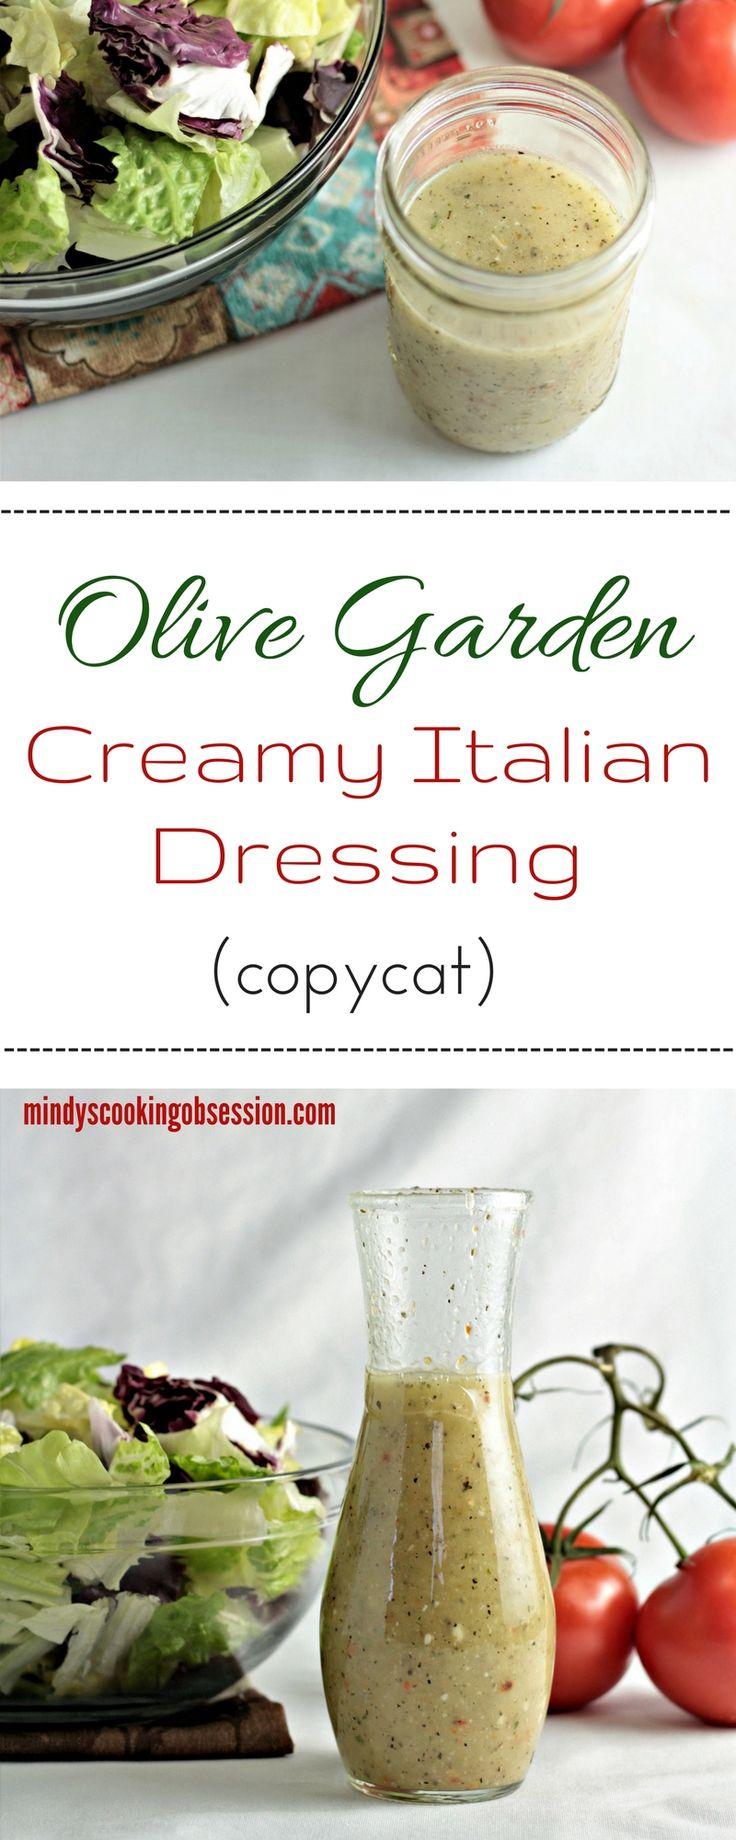 Best 25 olive garden italian dressing ideas on pinterest olive garden salad salad dressing for Olive garden salad dressing recipe secret